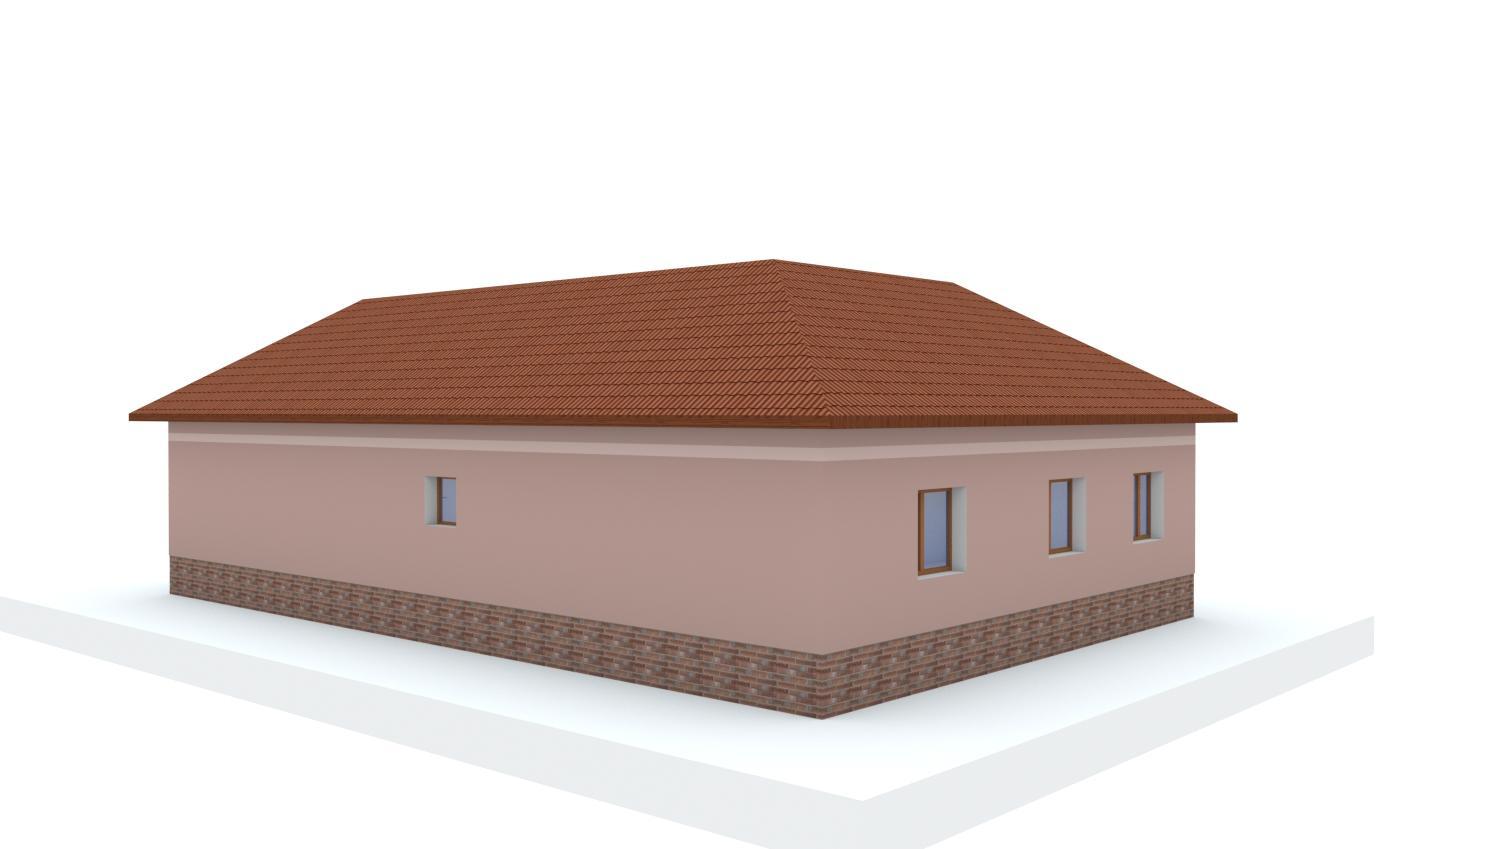 Návrh fasády rodinného domu - Obrázok č. 7